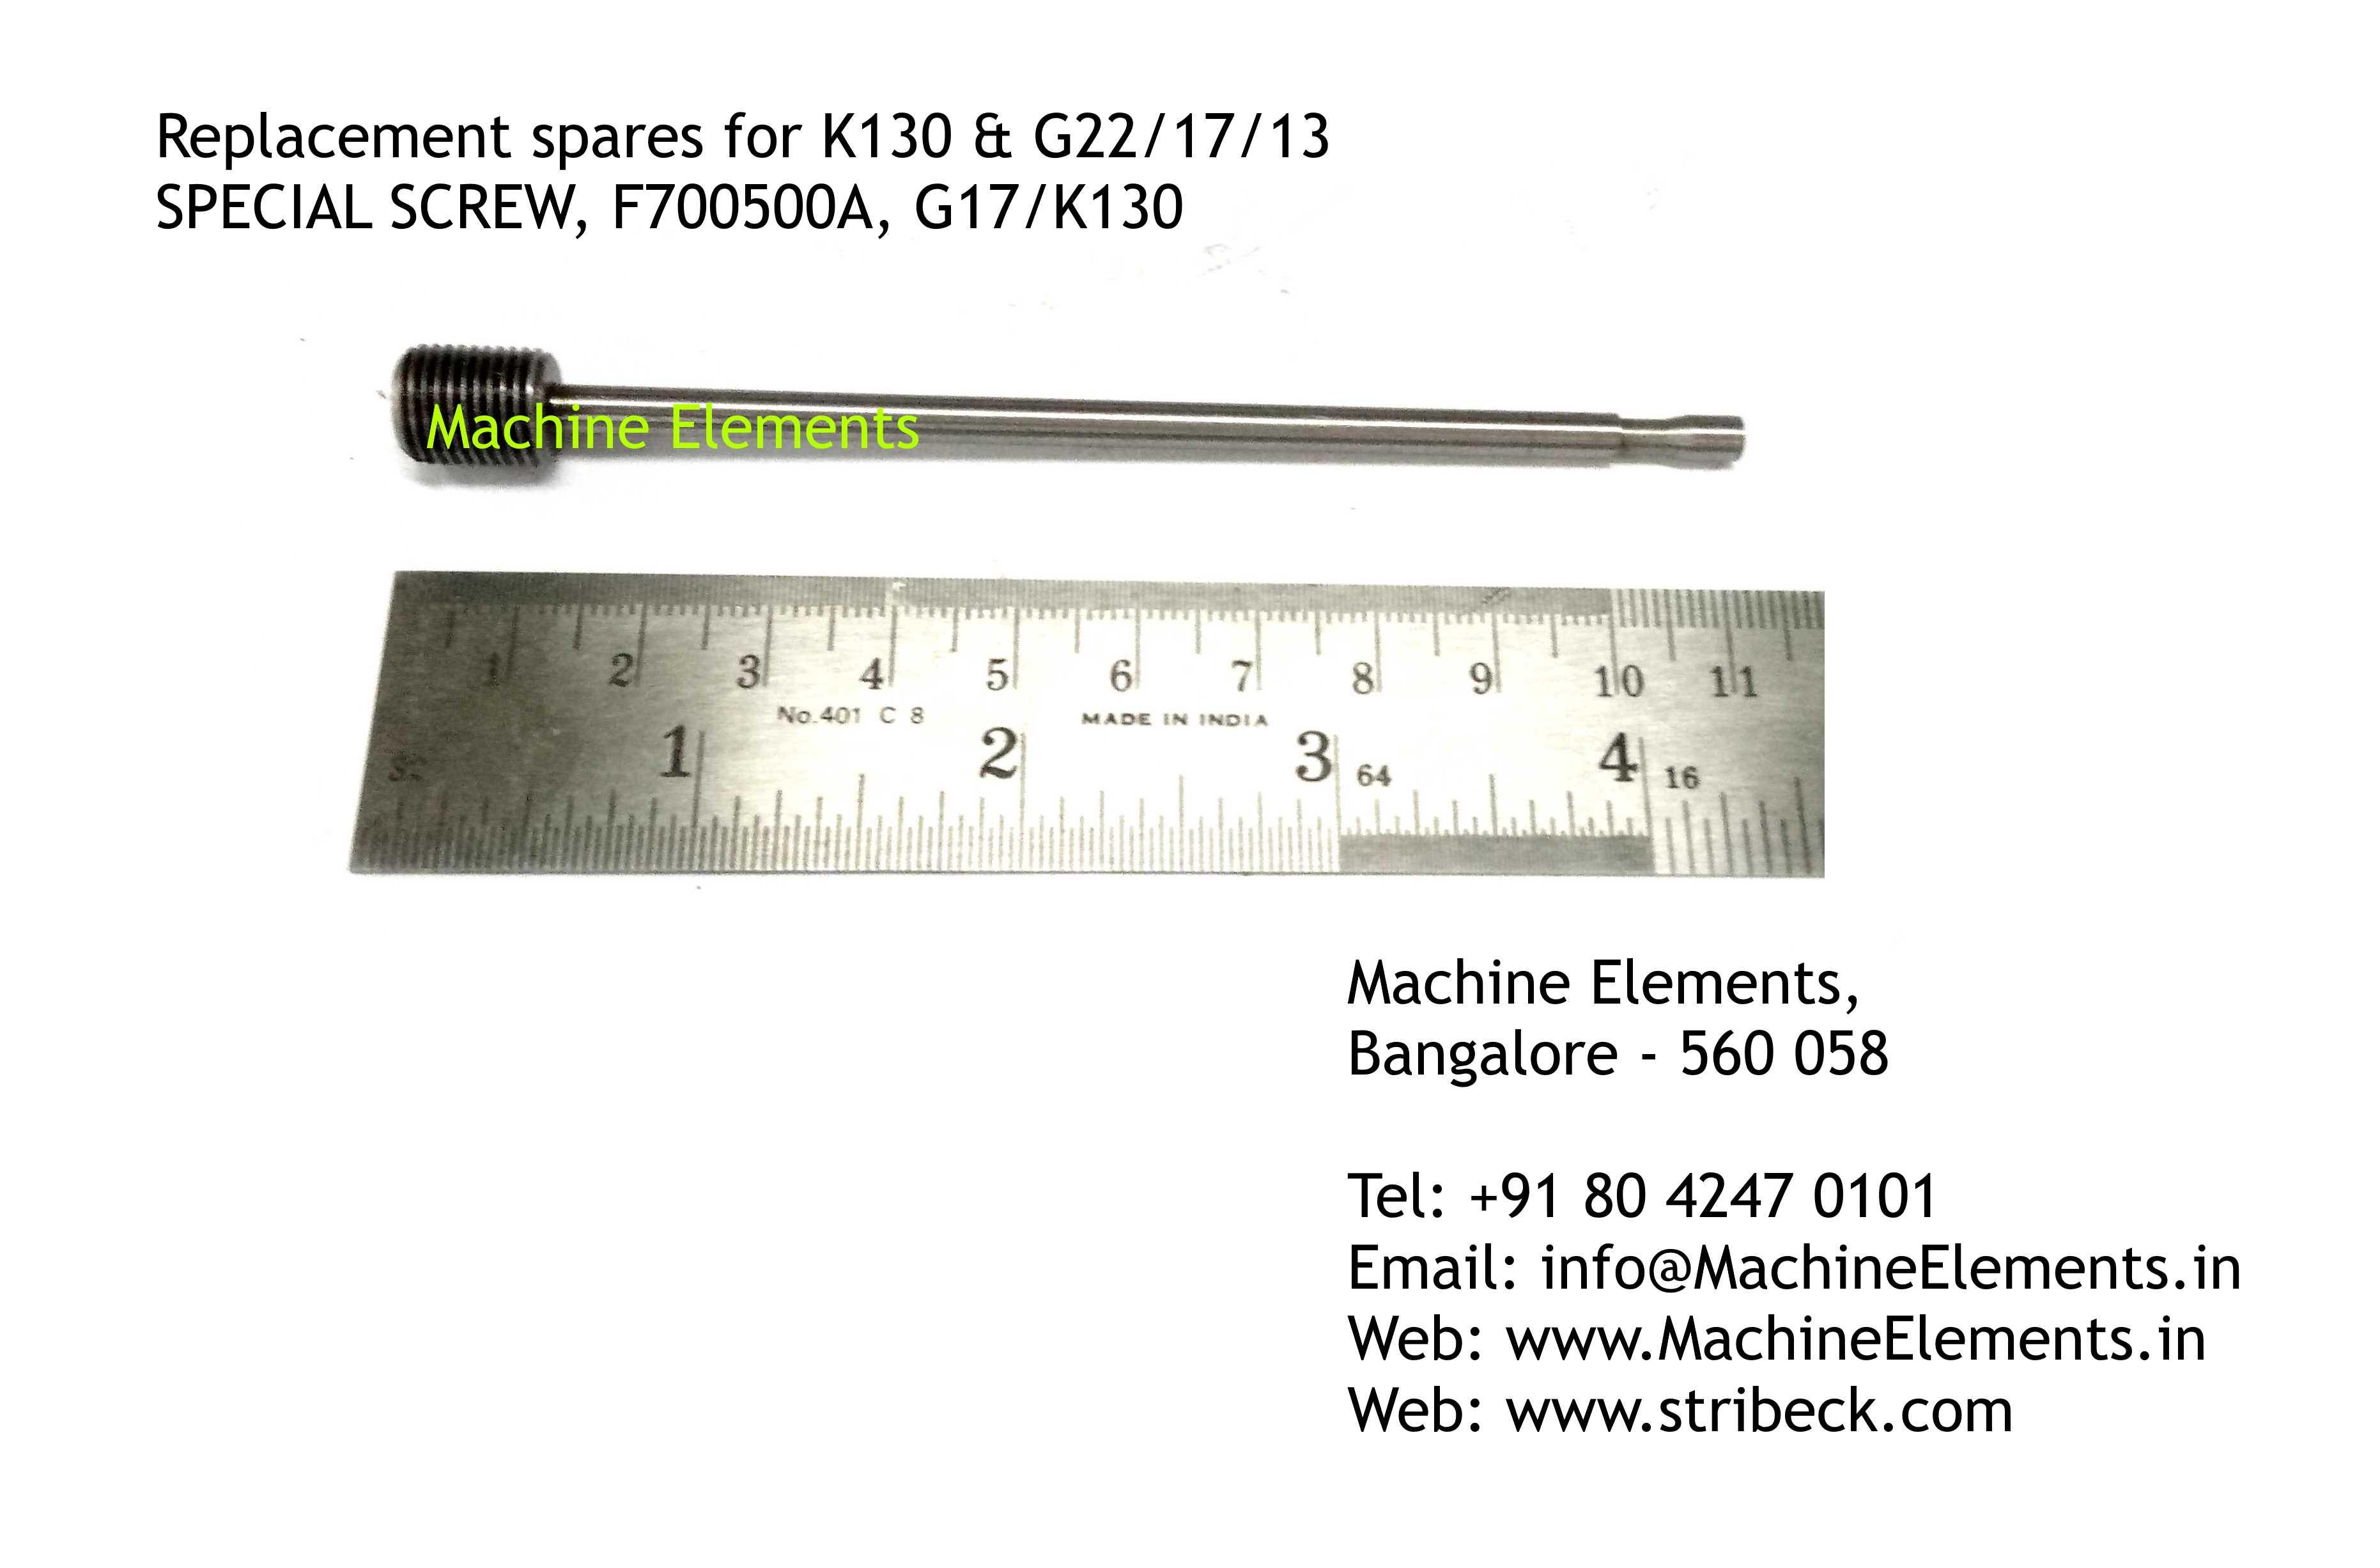 SPECIAL SCREW, F700500A